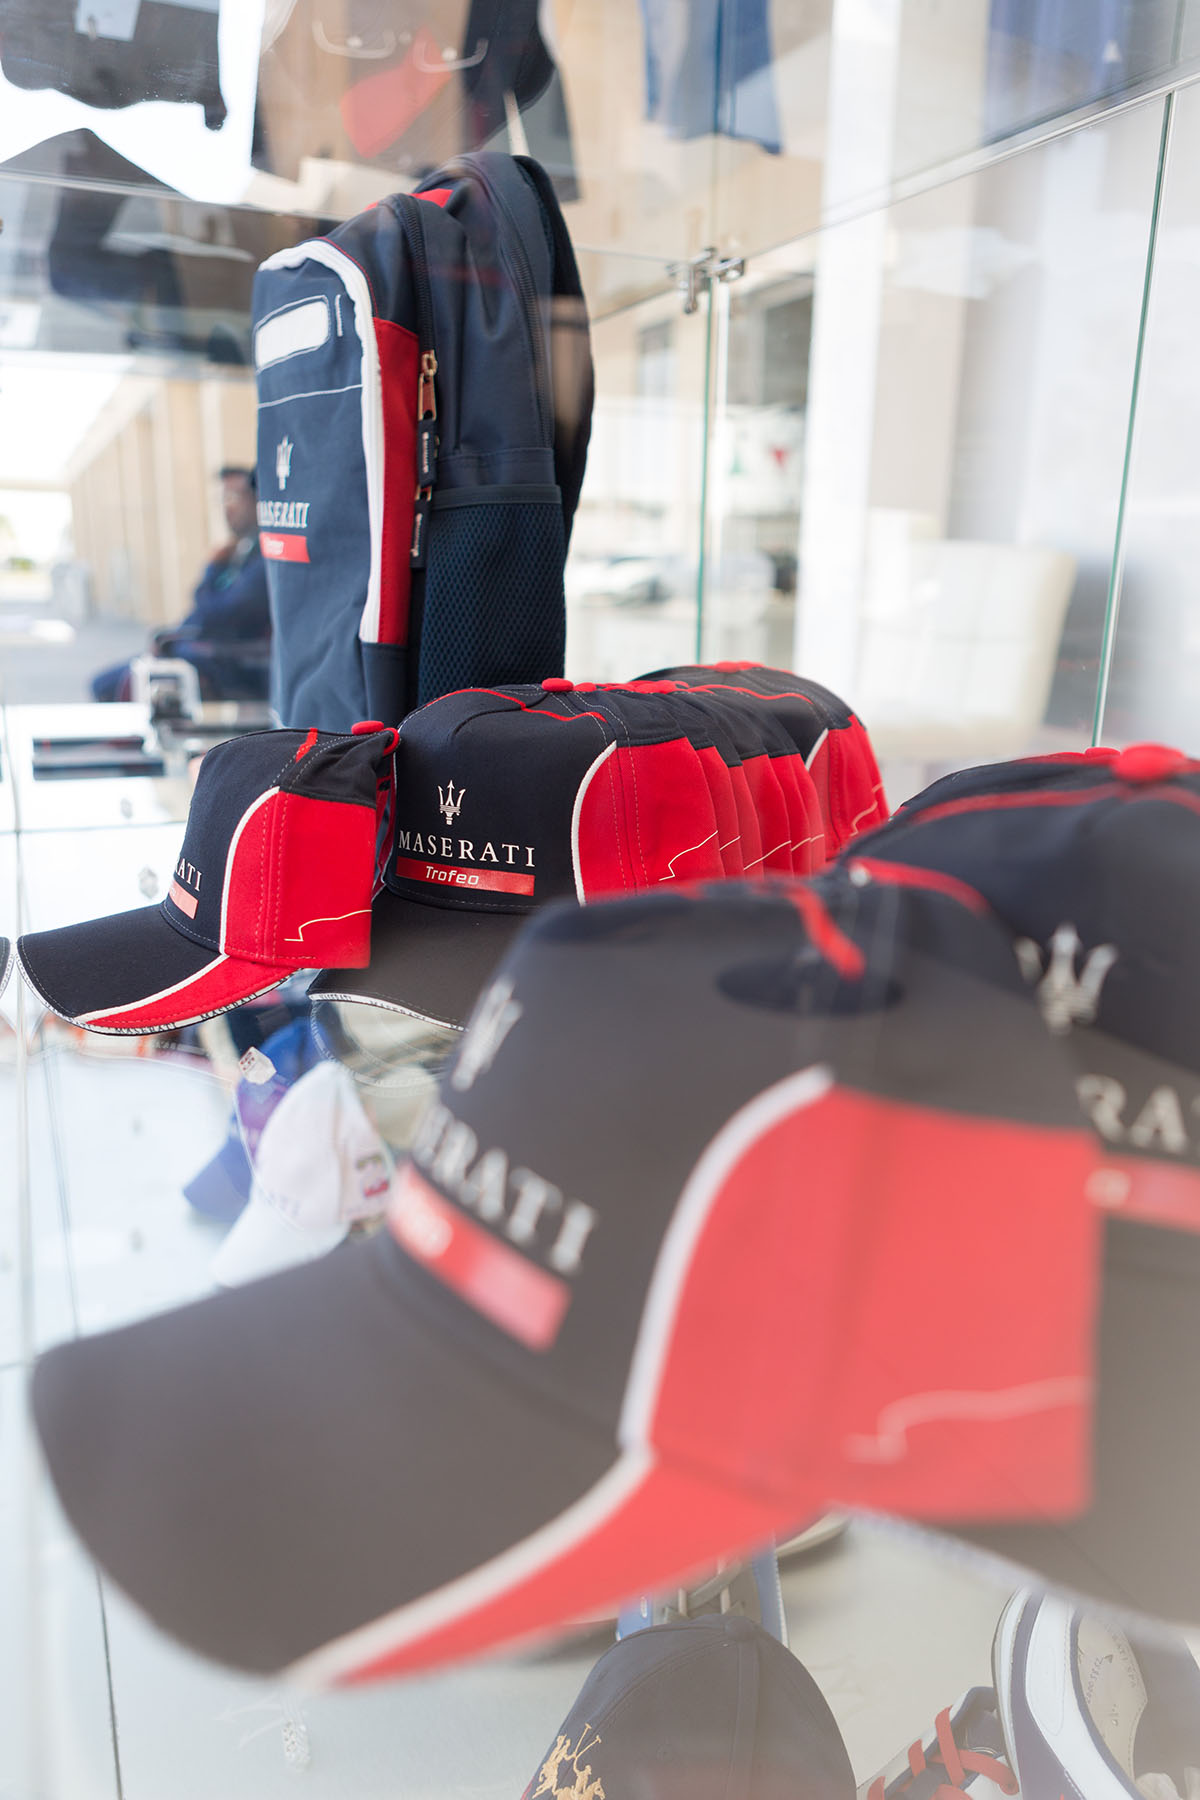 Merchandise at the Maserati Trofeo event by Loesje Kessels Fashion Photographer Dubai